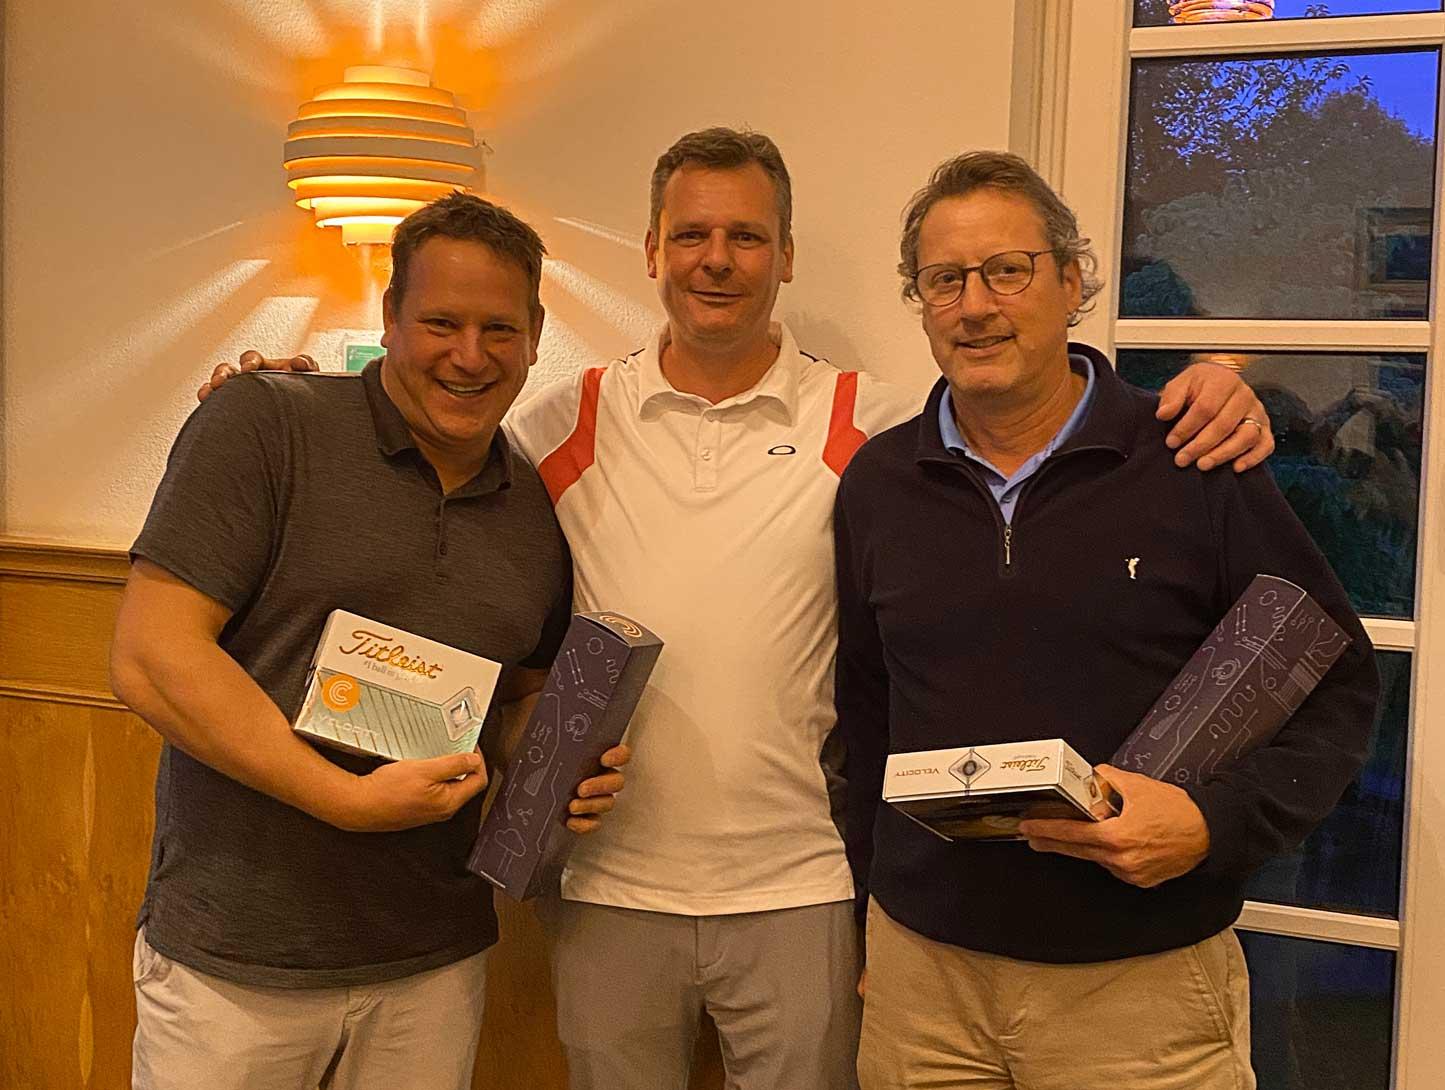 210930_cocus_Blog_Event_Golf10